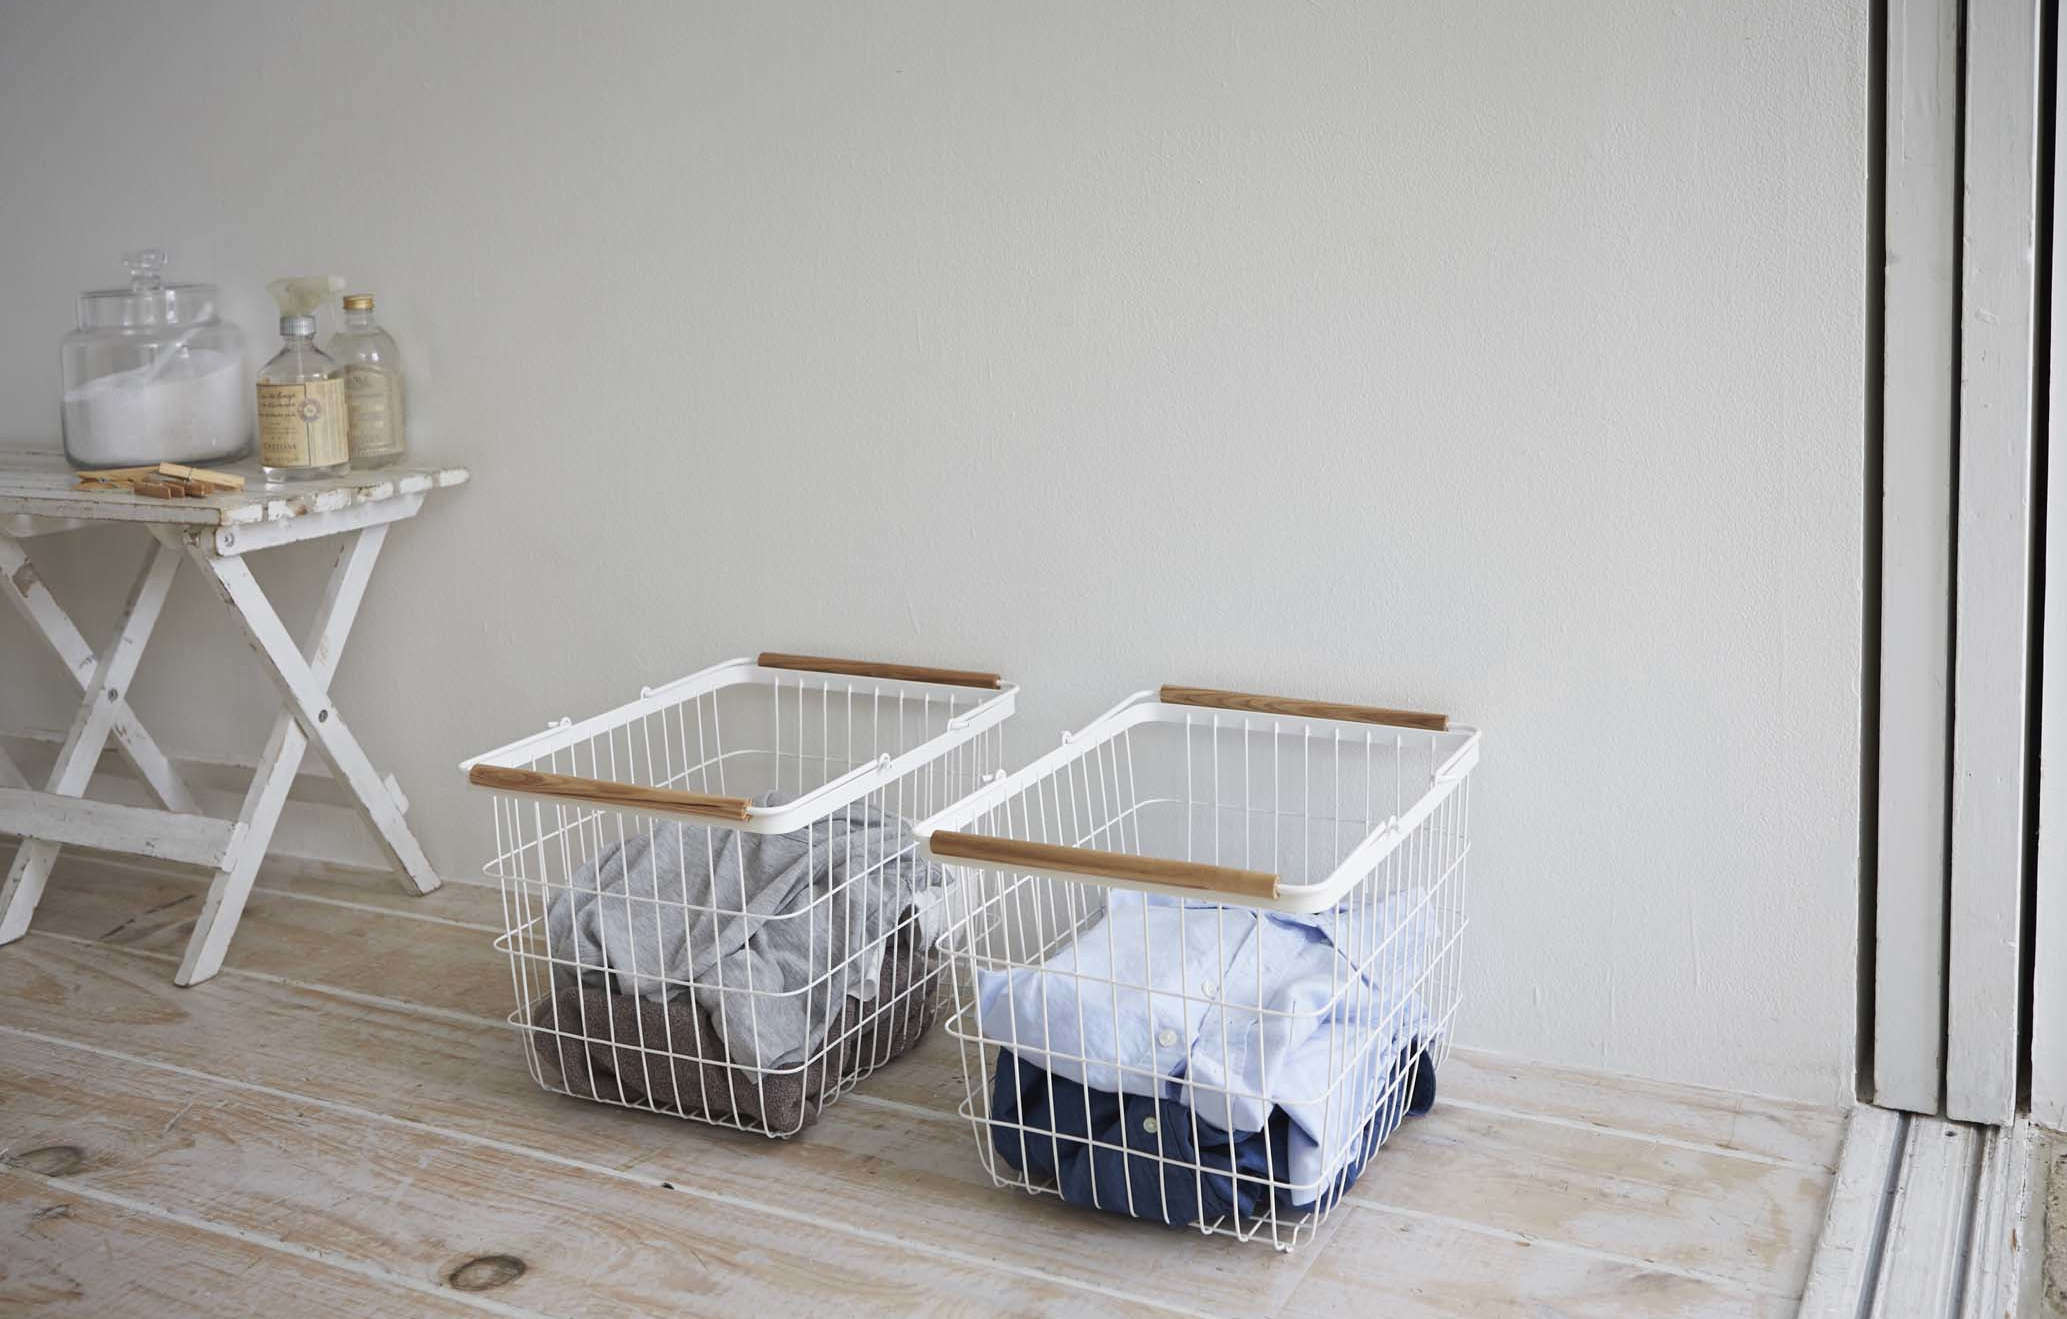 Genius LowCost Storage Solutions from Japan Yamazaki Tosca Laundry Basket